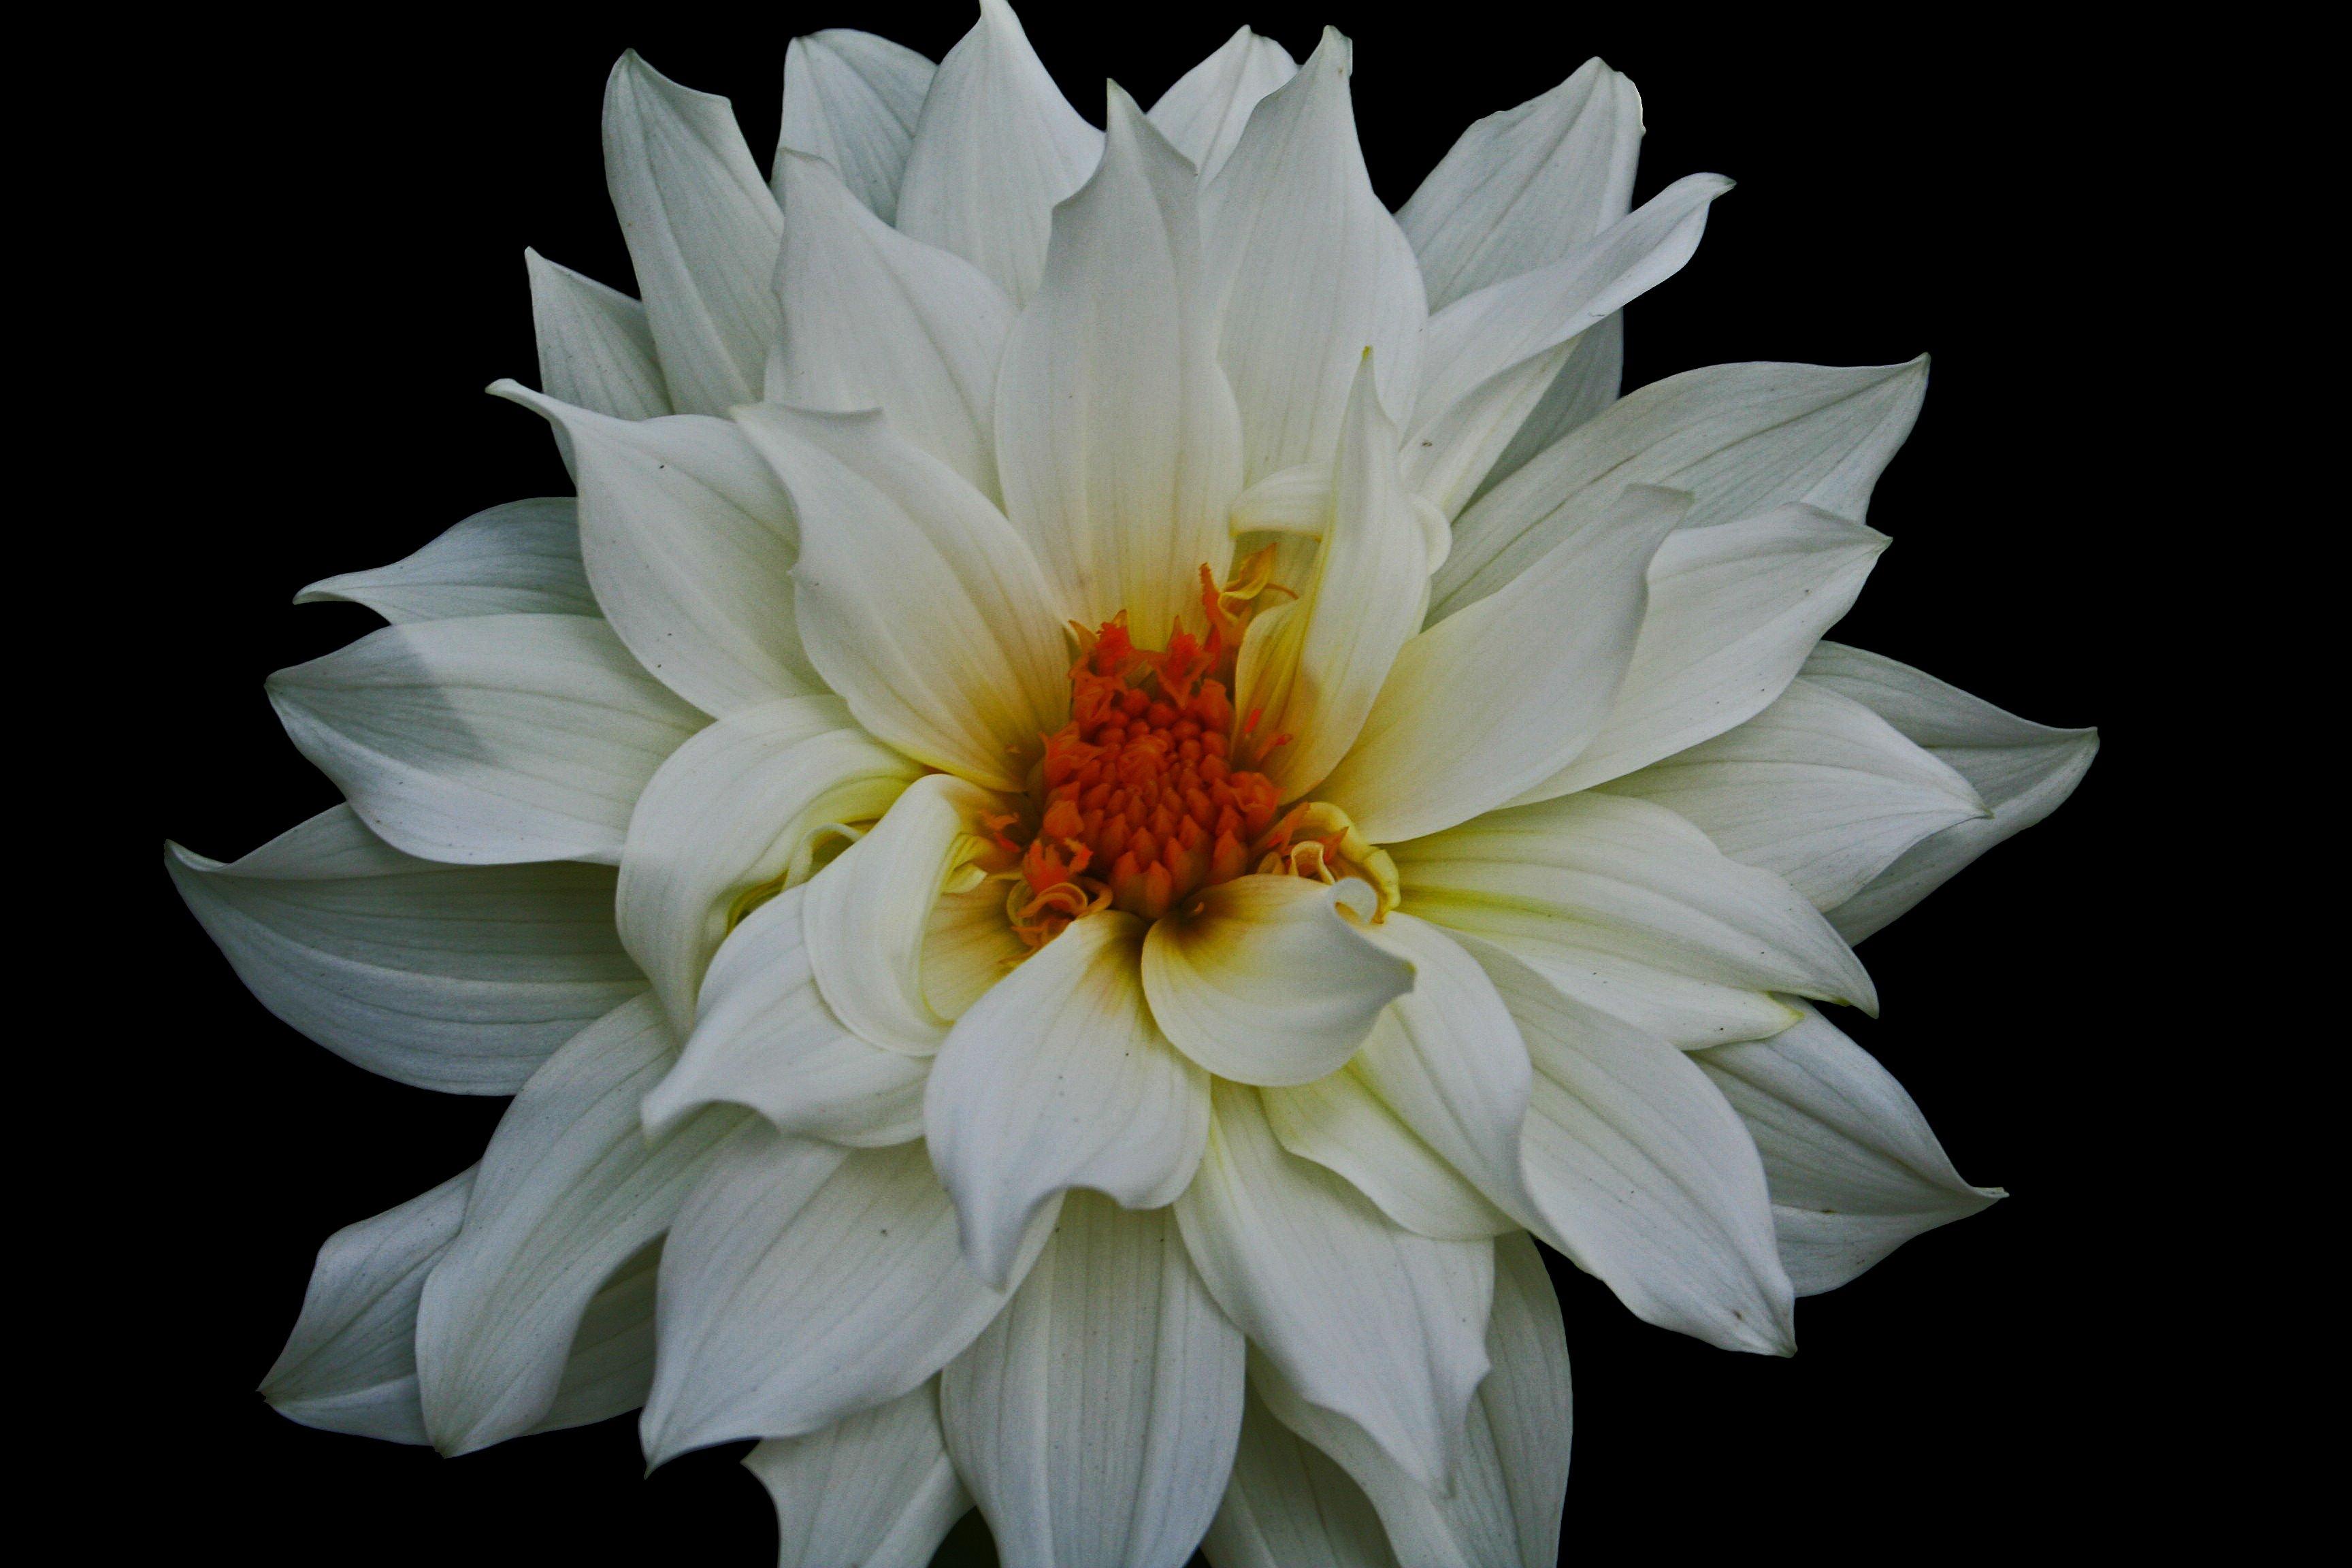 Filebeautiful white flower west virginia forestwanderg filebeautiful white flower west virginia forestwanderg izmirmasajfo